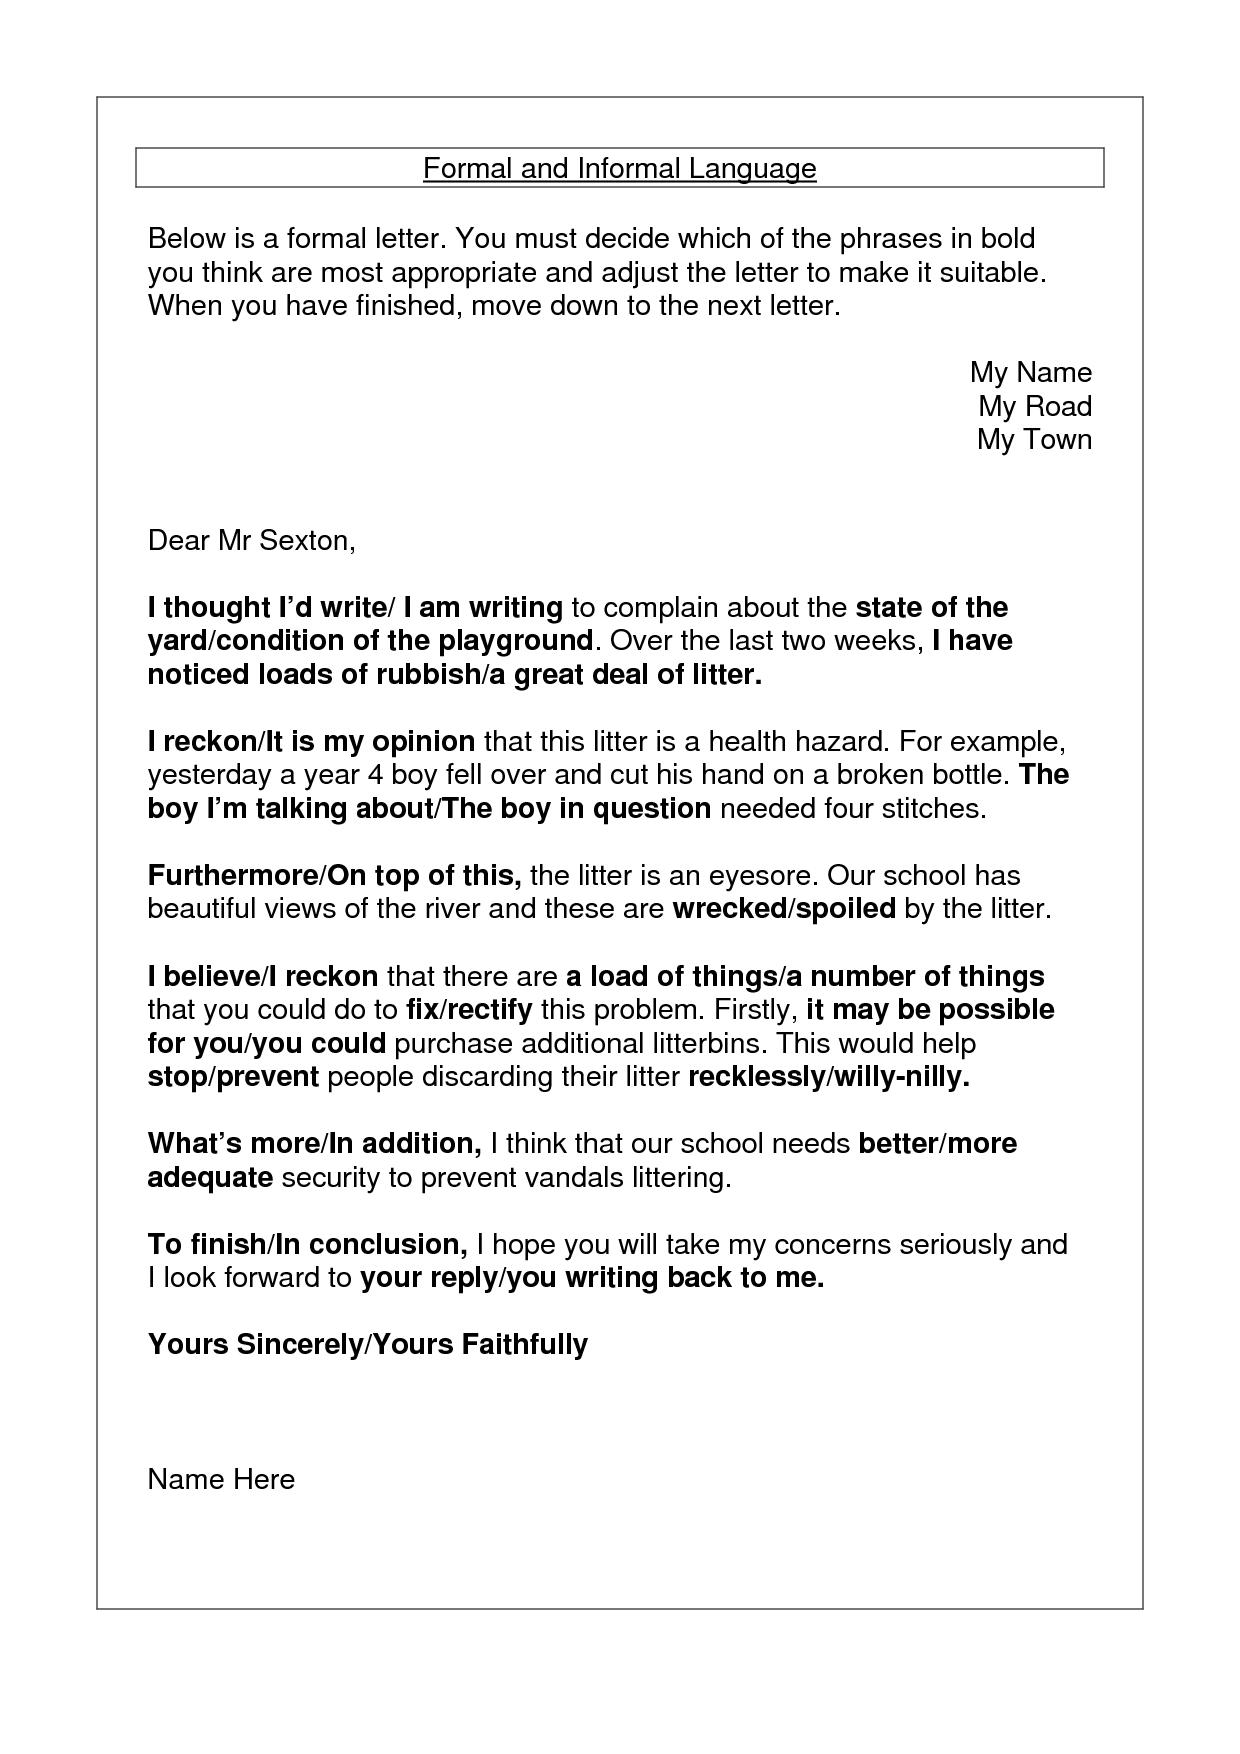 Formal Letter Sample Formal And Informal Language Writing